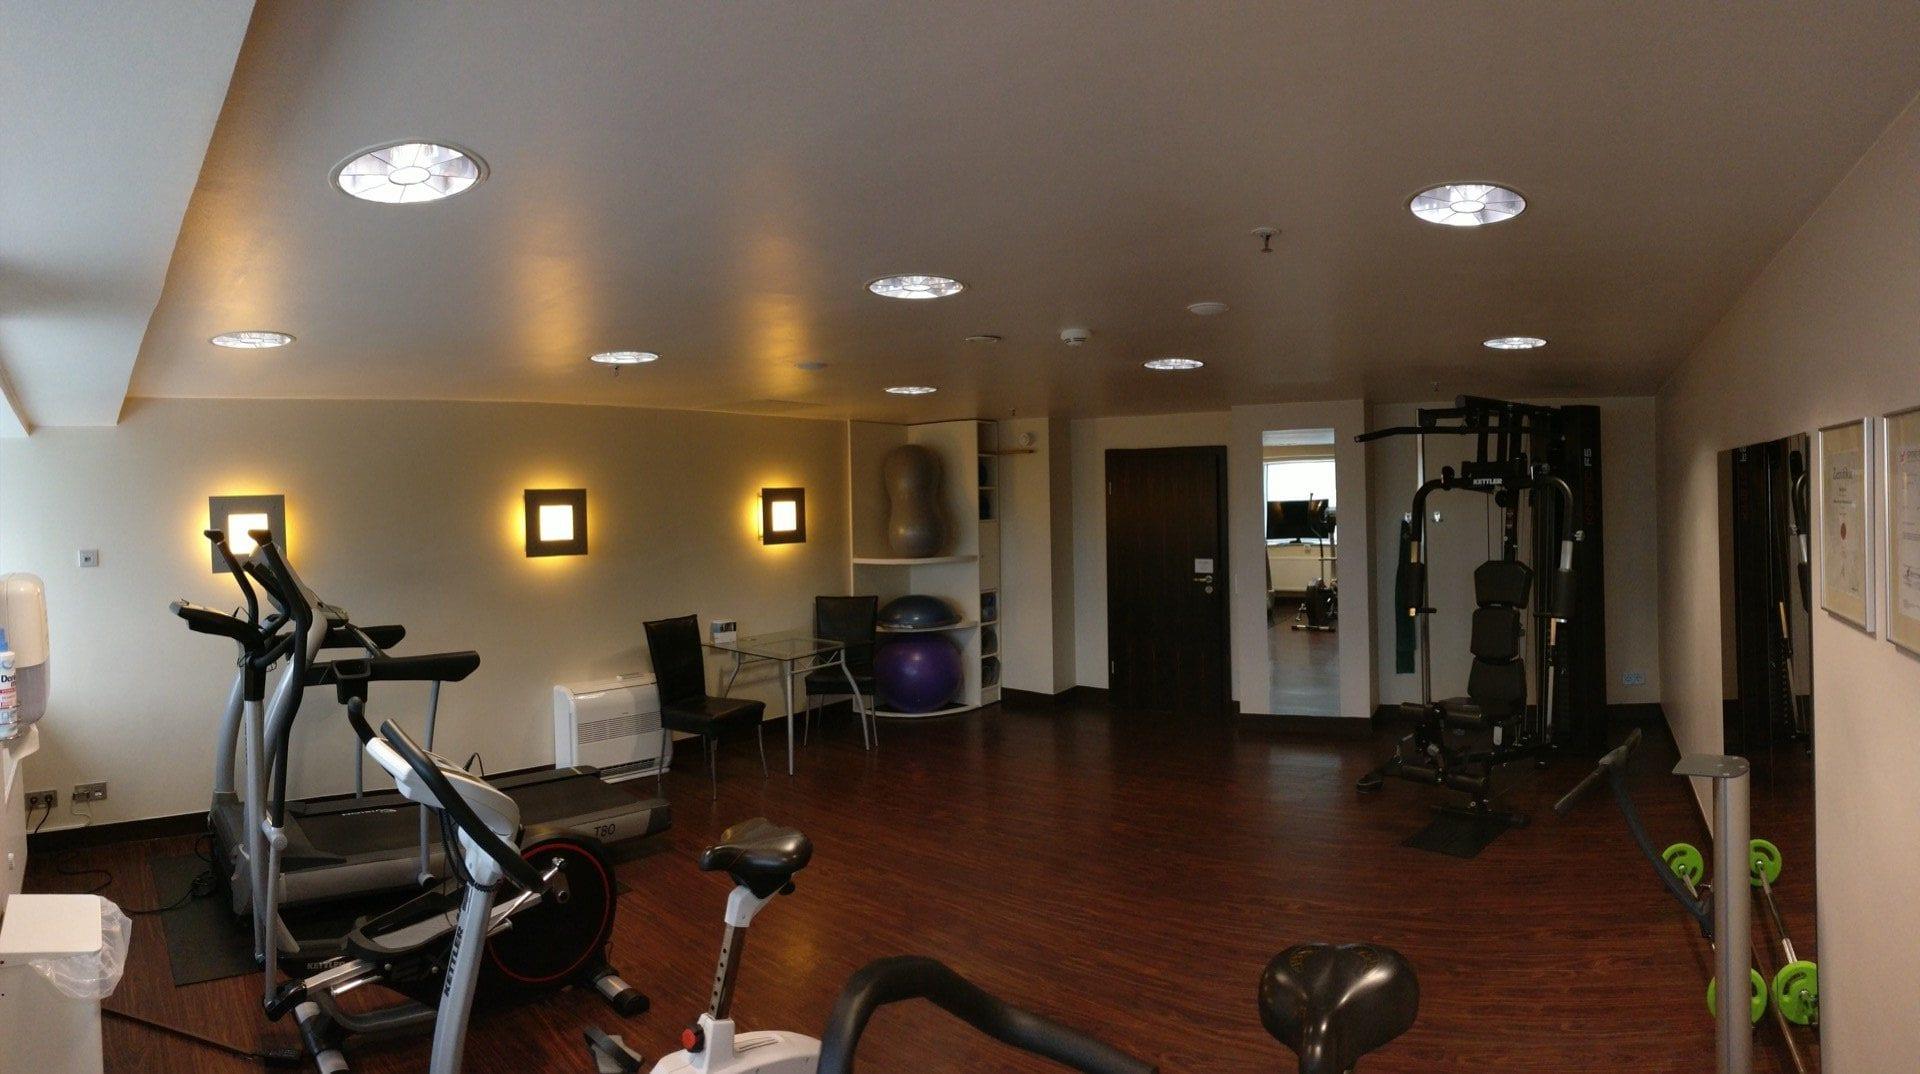 Hotel pullman dresden newa fitness for Pullman dresden newa